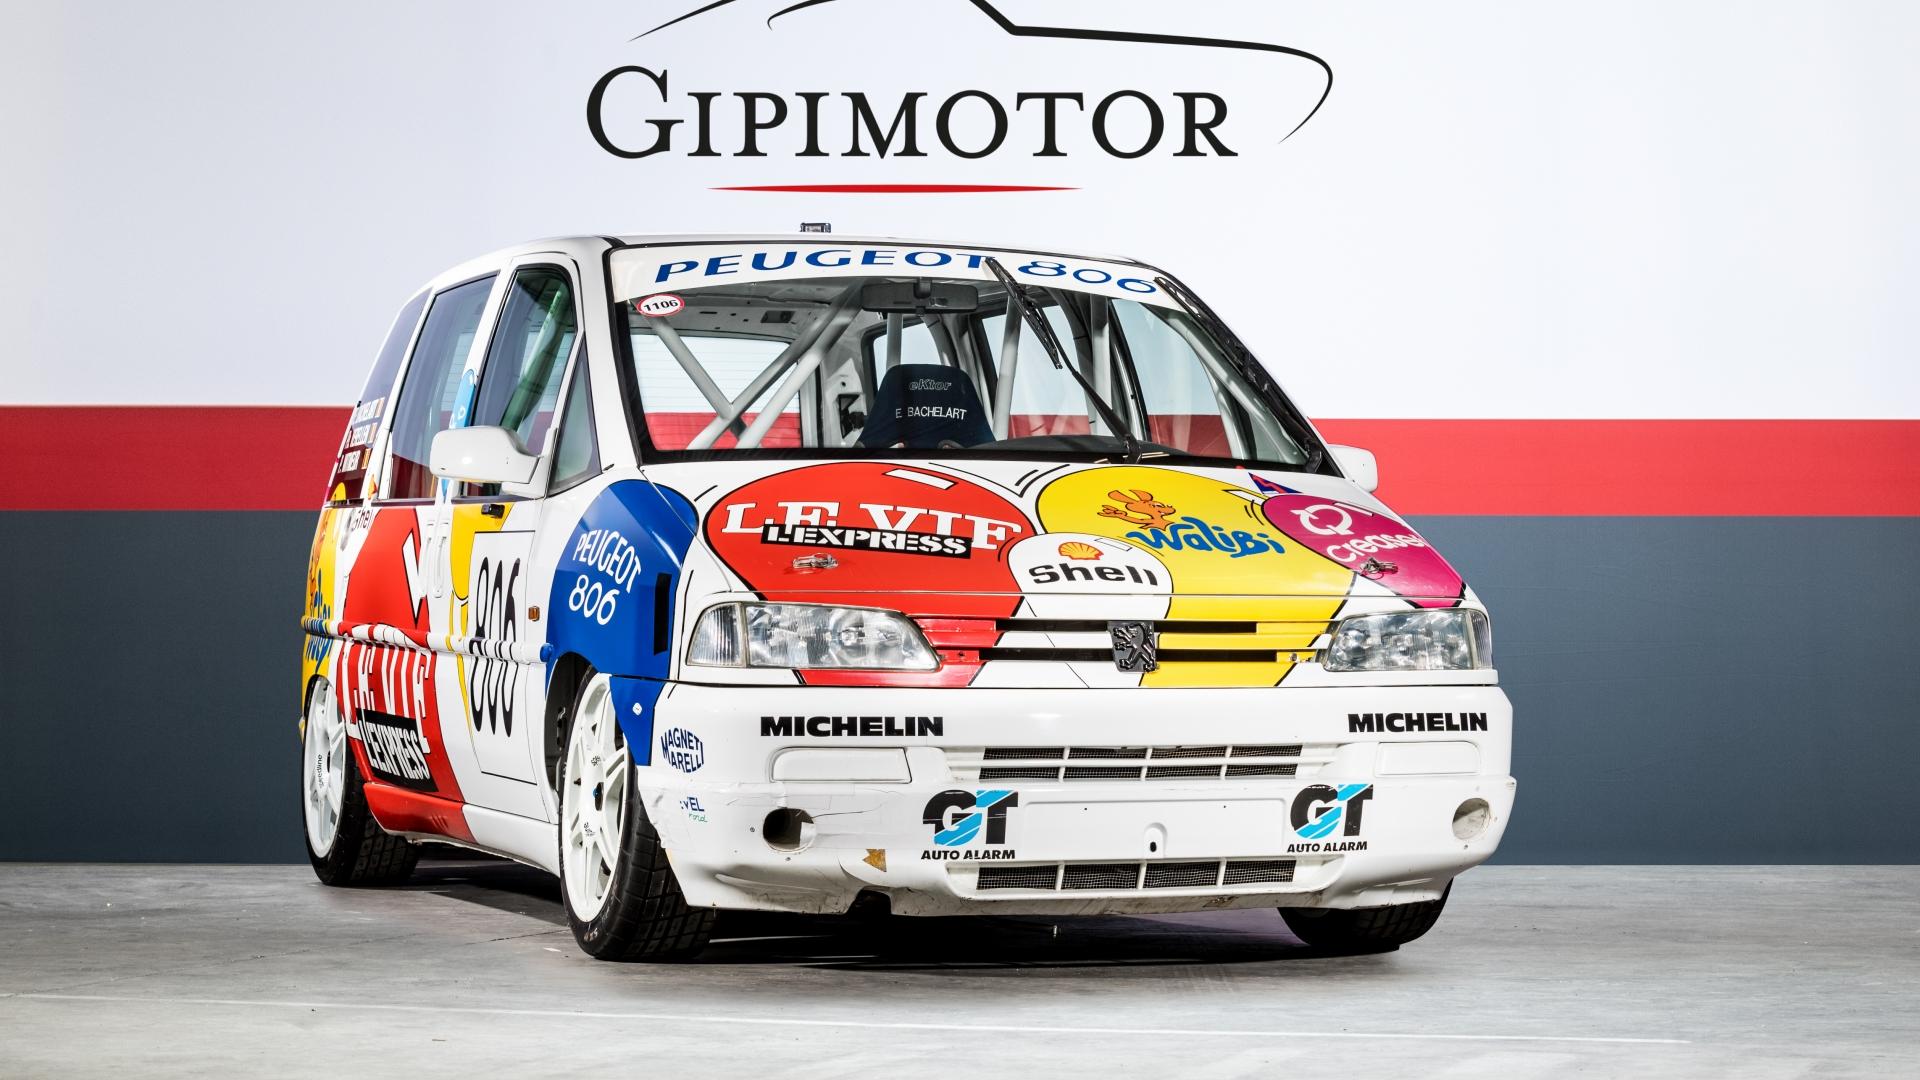 Peugeot - Peugeot 806 Procar · Gipimotor